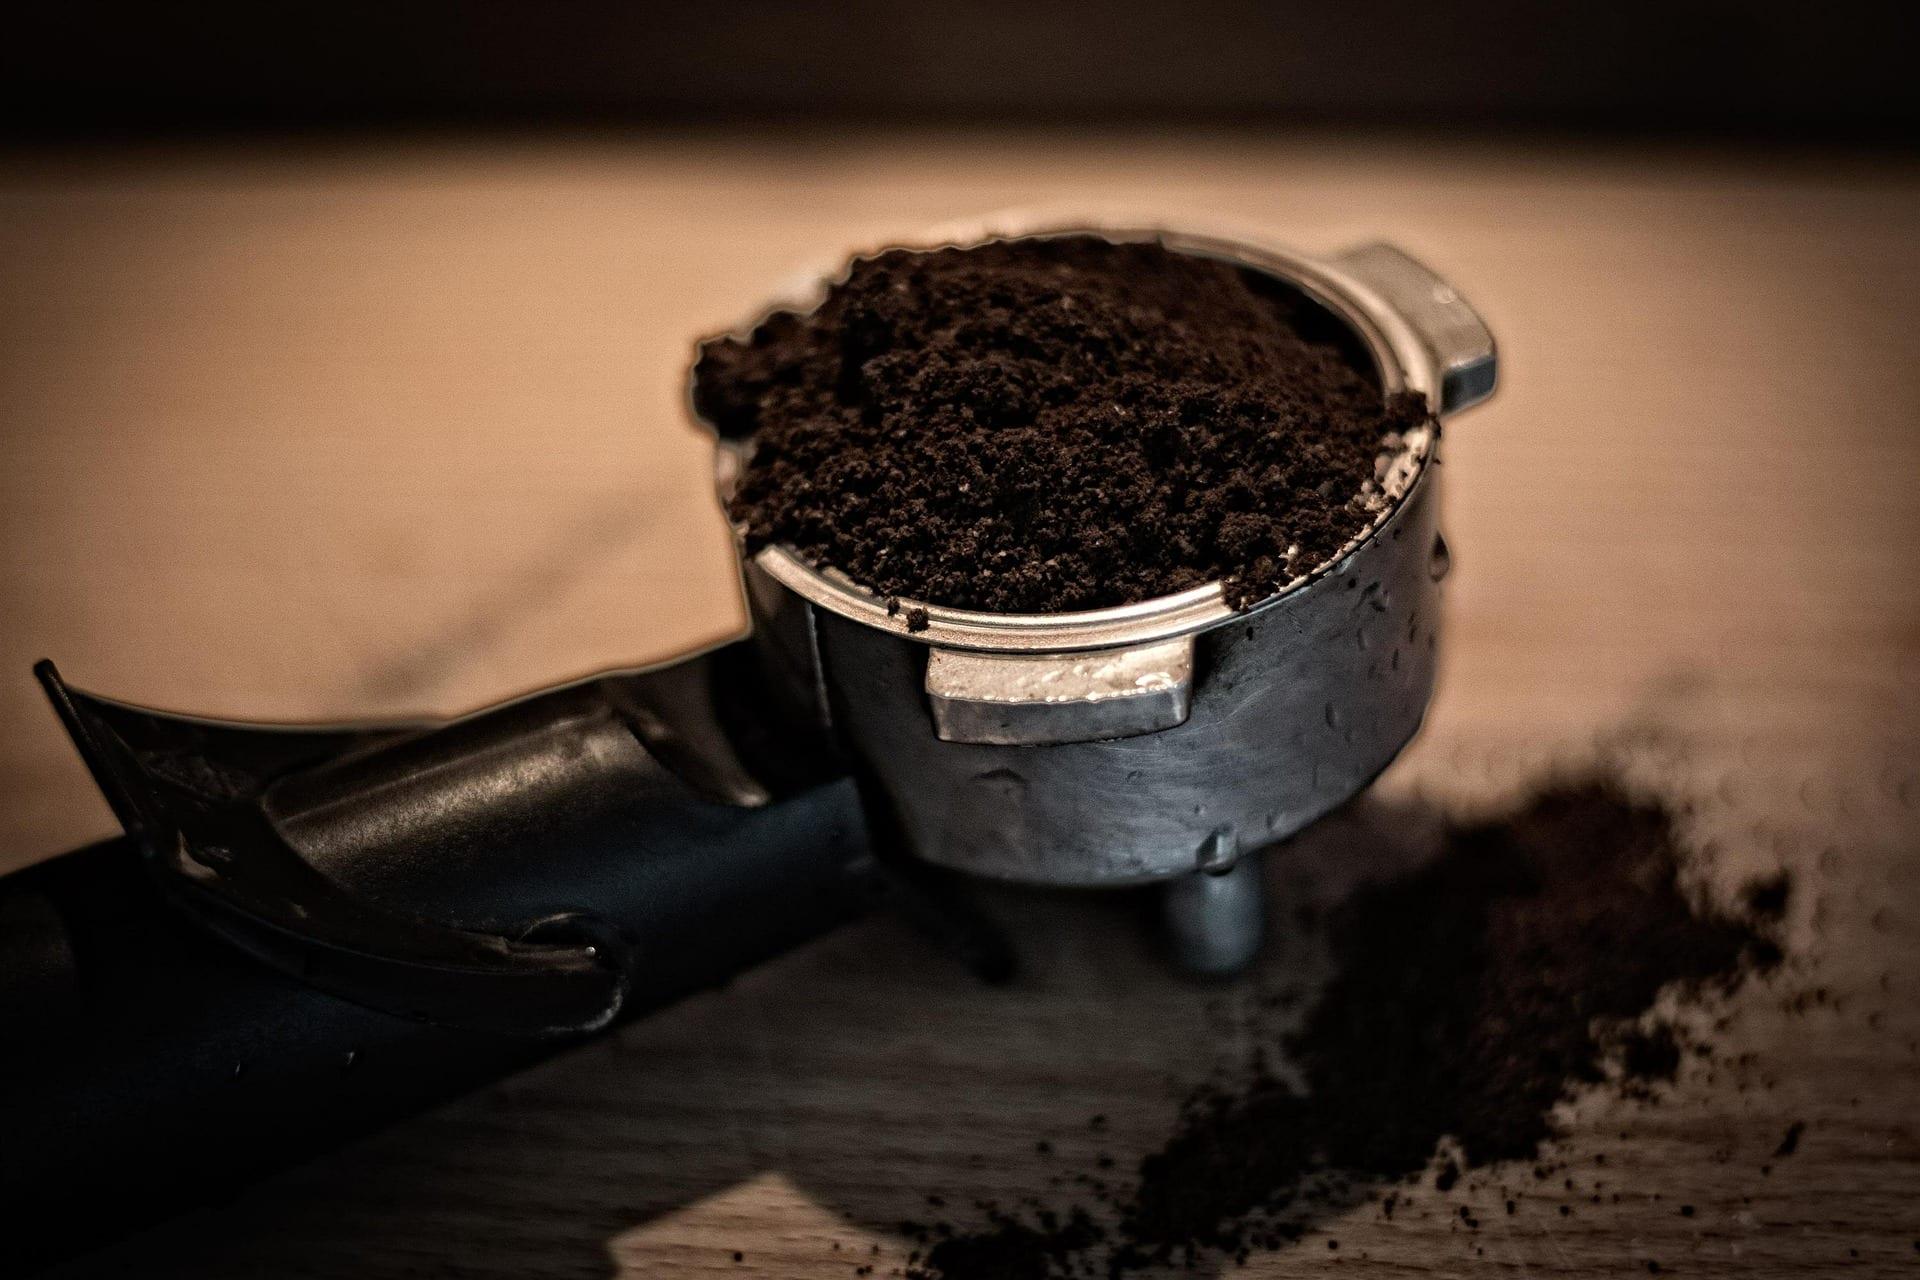 Organic Gardening: 1 VIDEO on Using Coffee Grounds as Fertiliser